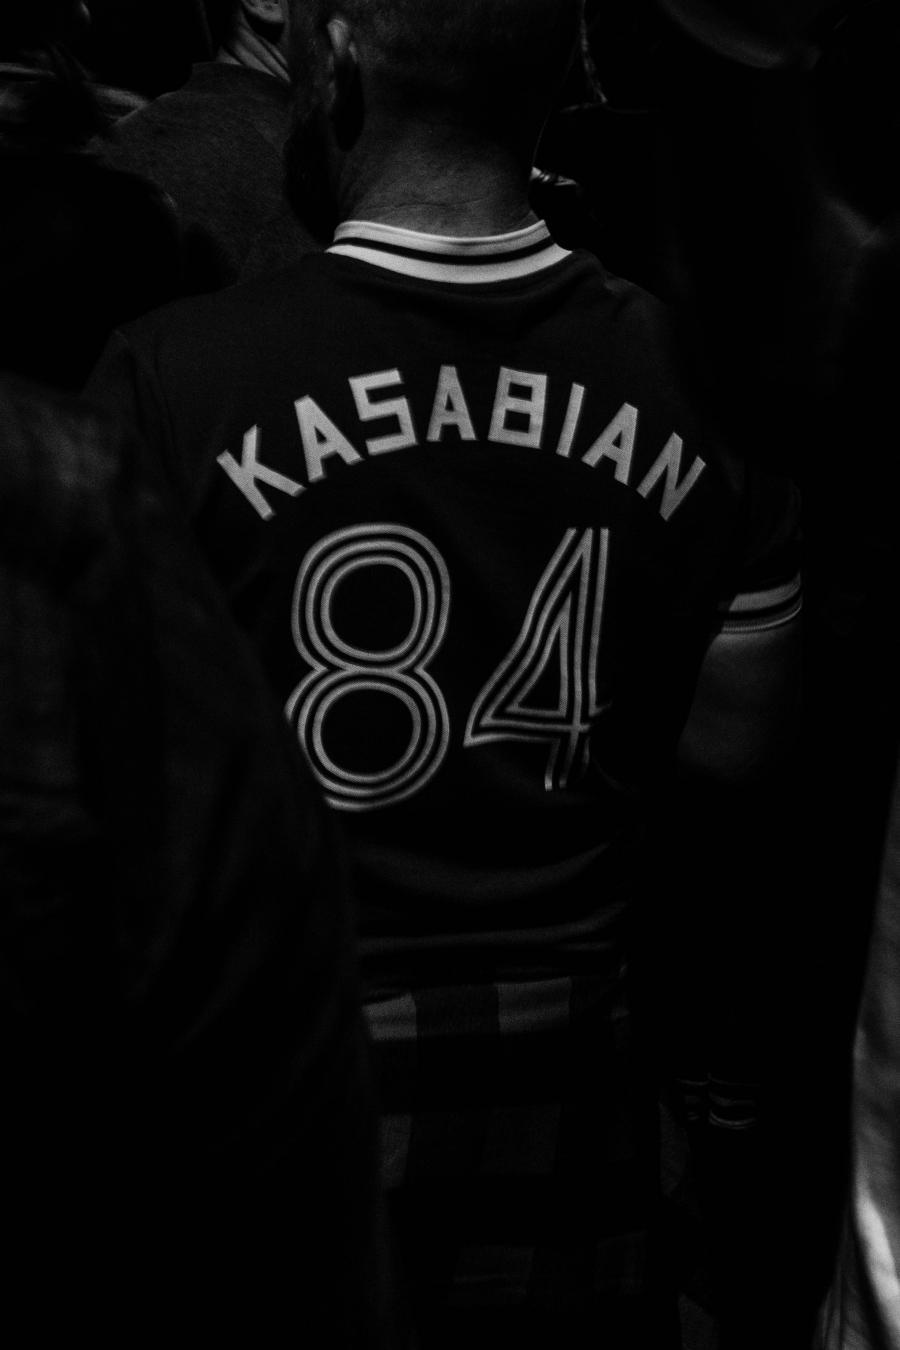 Kasabian by Giovanett Janis